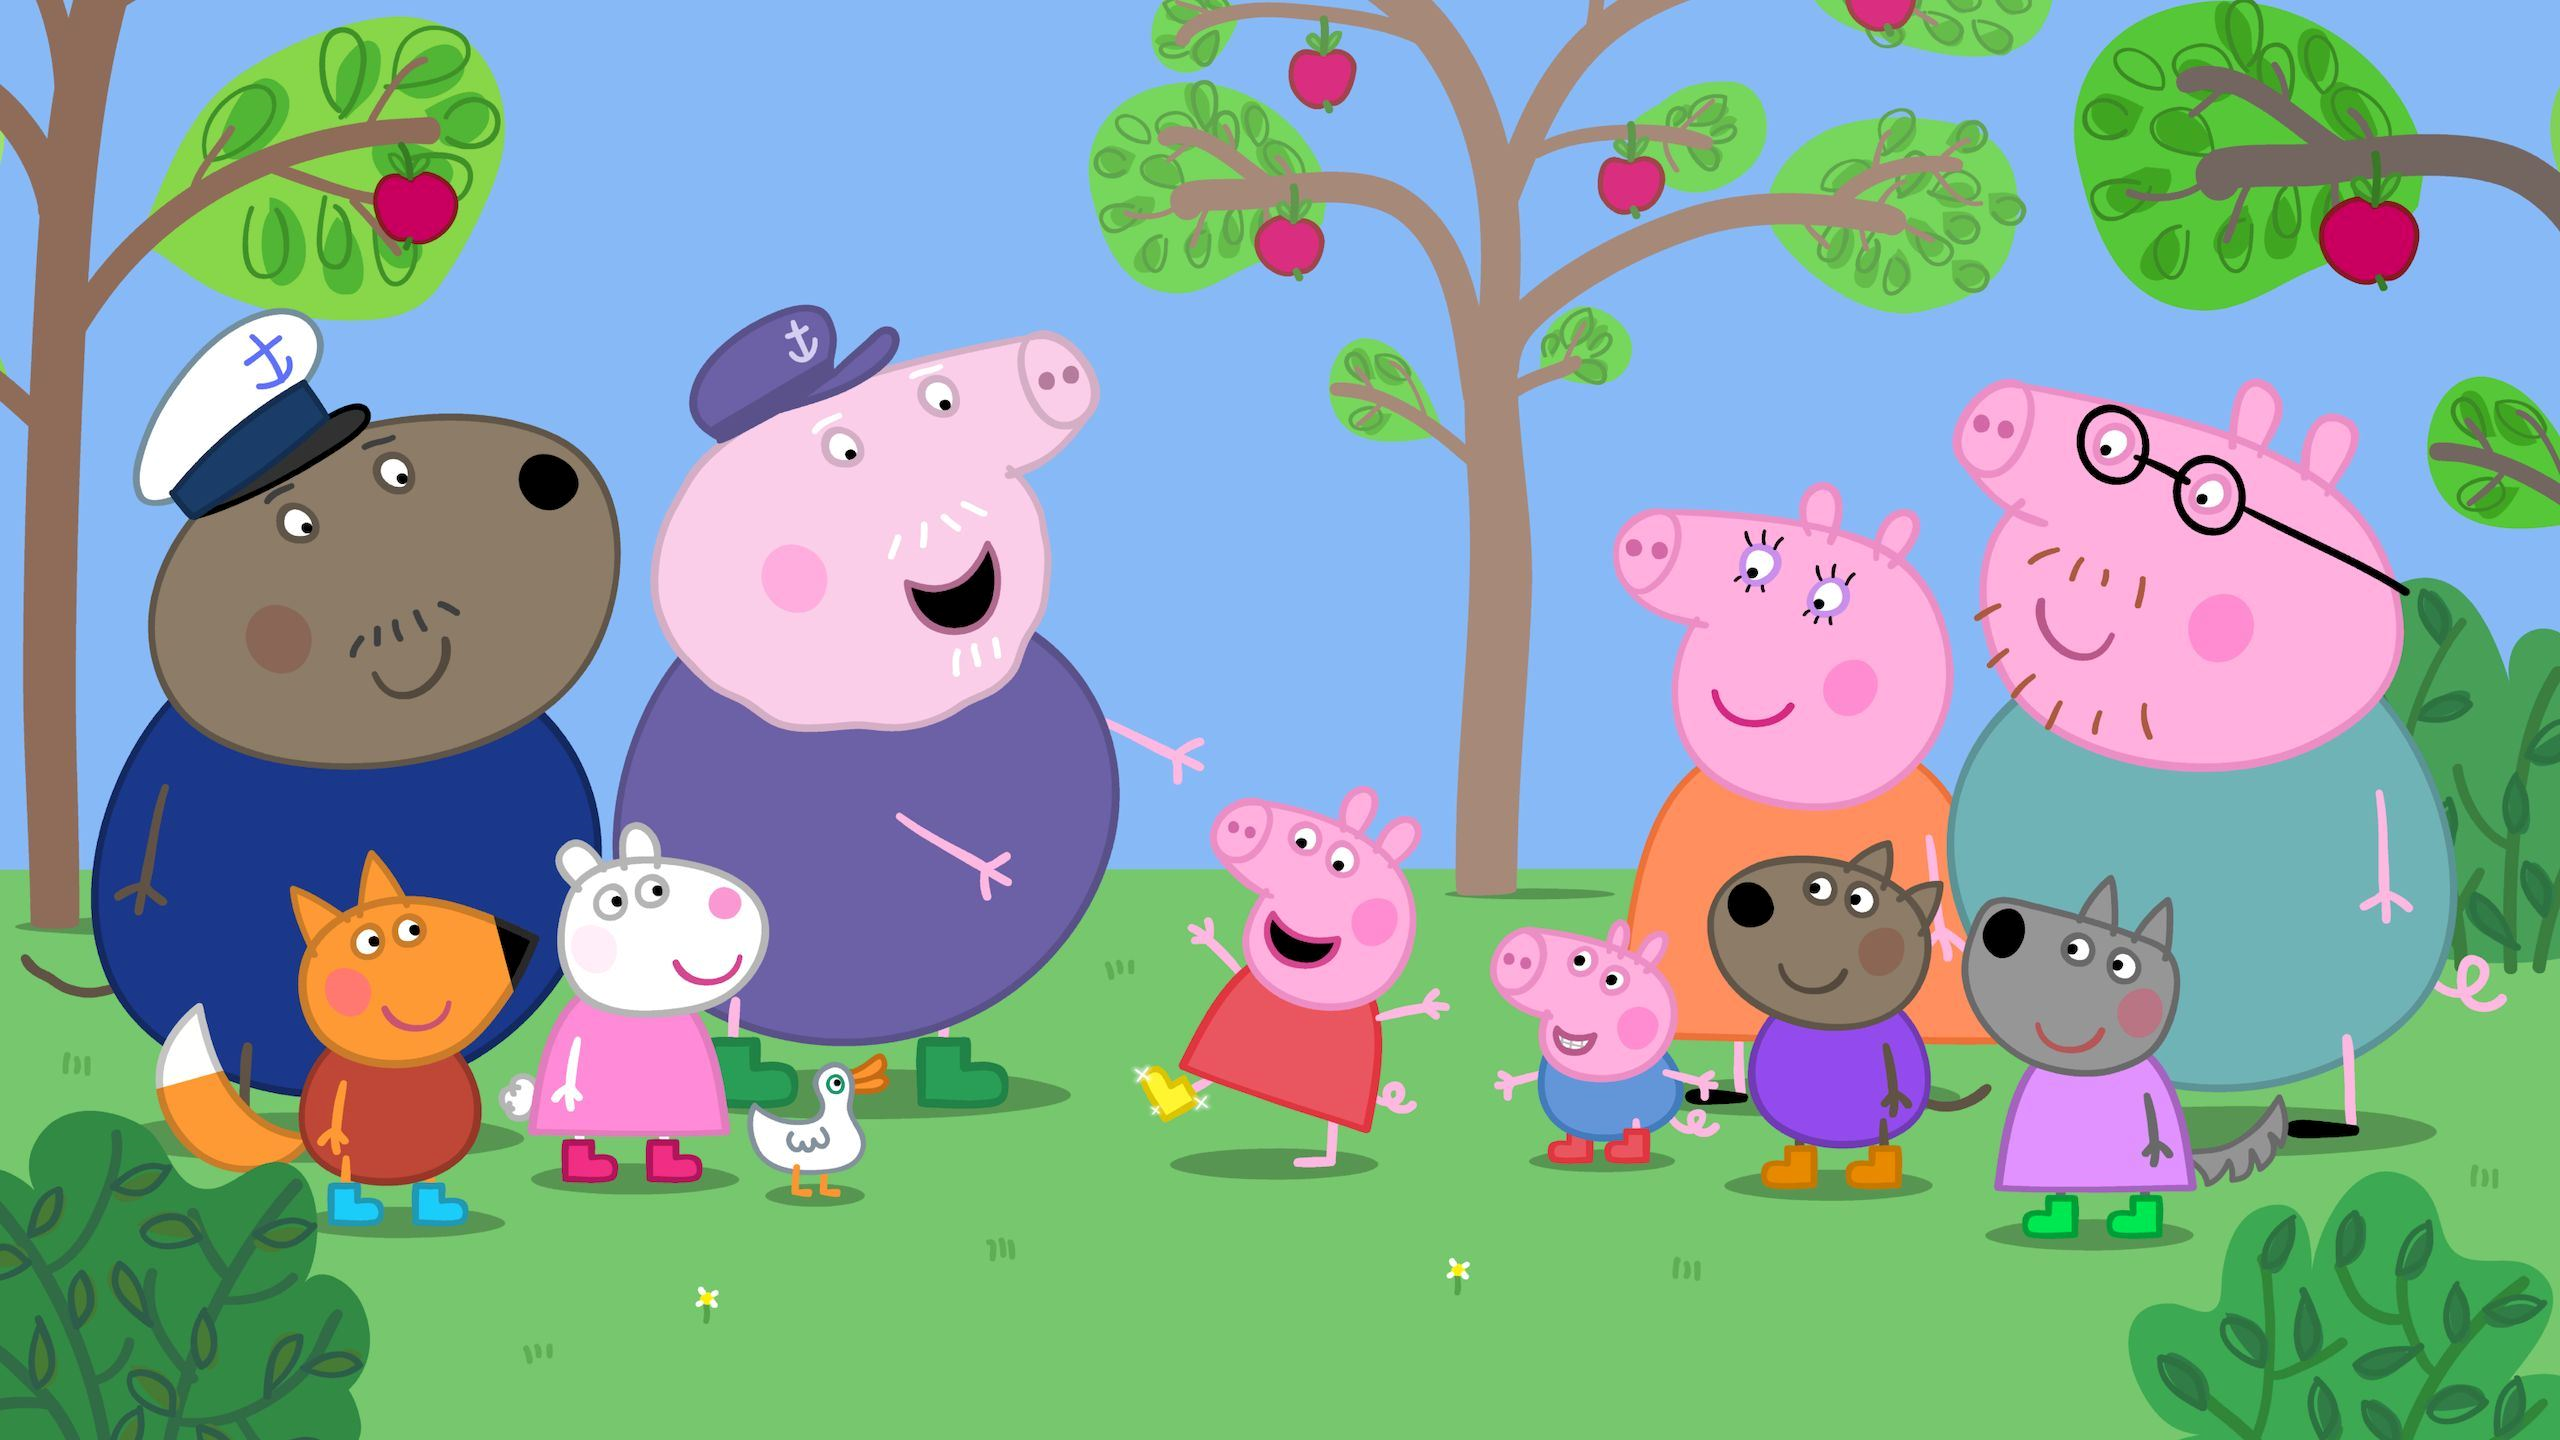 Dibujos de Peppa Pig for Android - APK Download